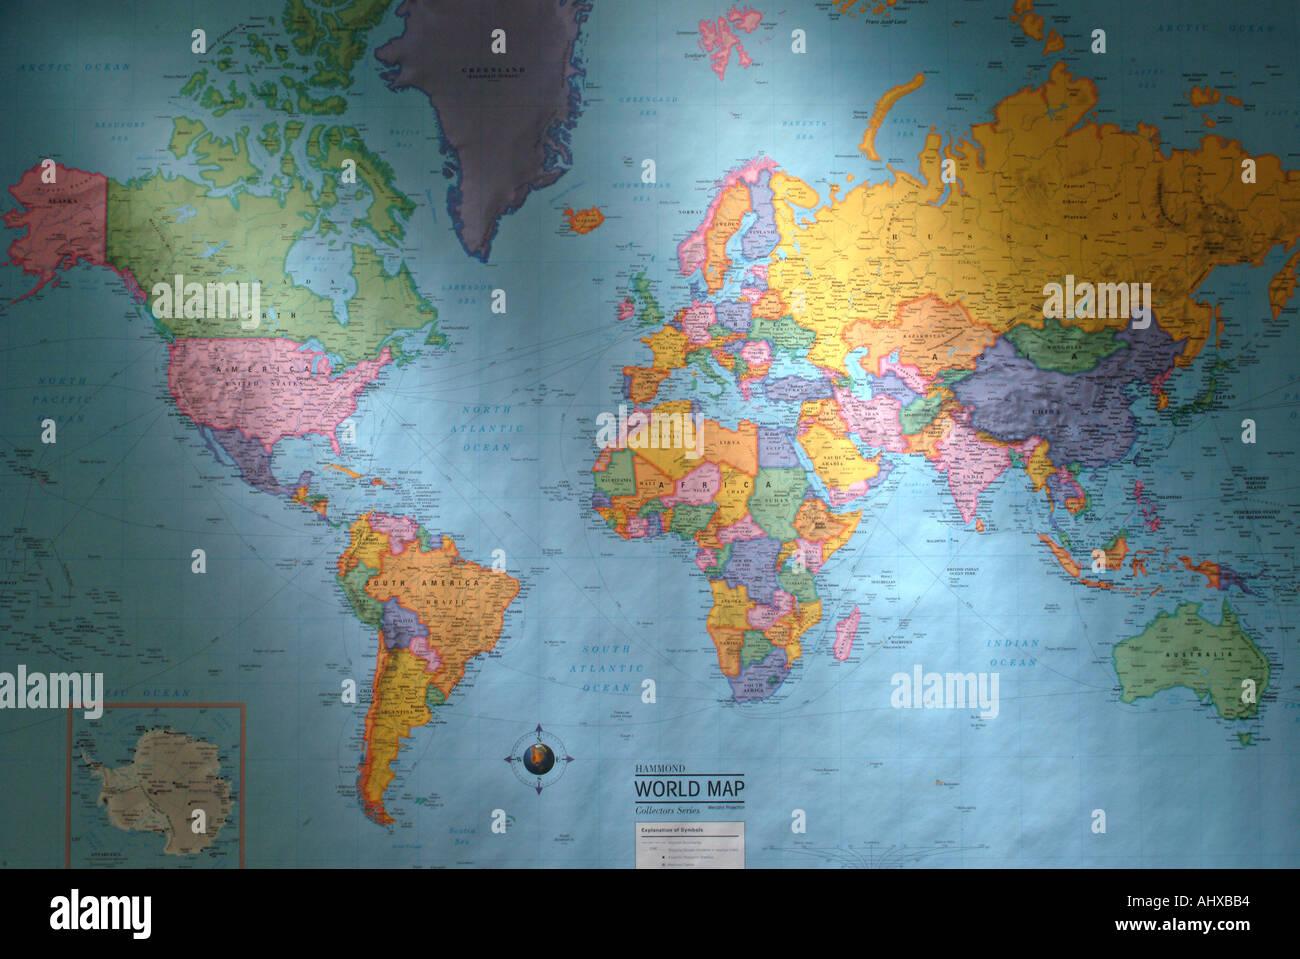 russia america map stockfotos russia america map bilder alamy. Black Bedroom Furniture Sets. Home Design Ideas